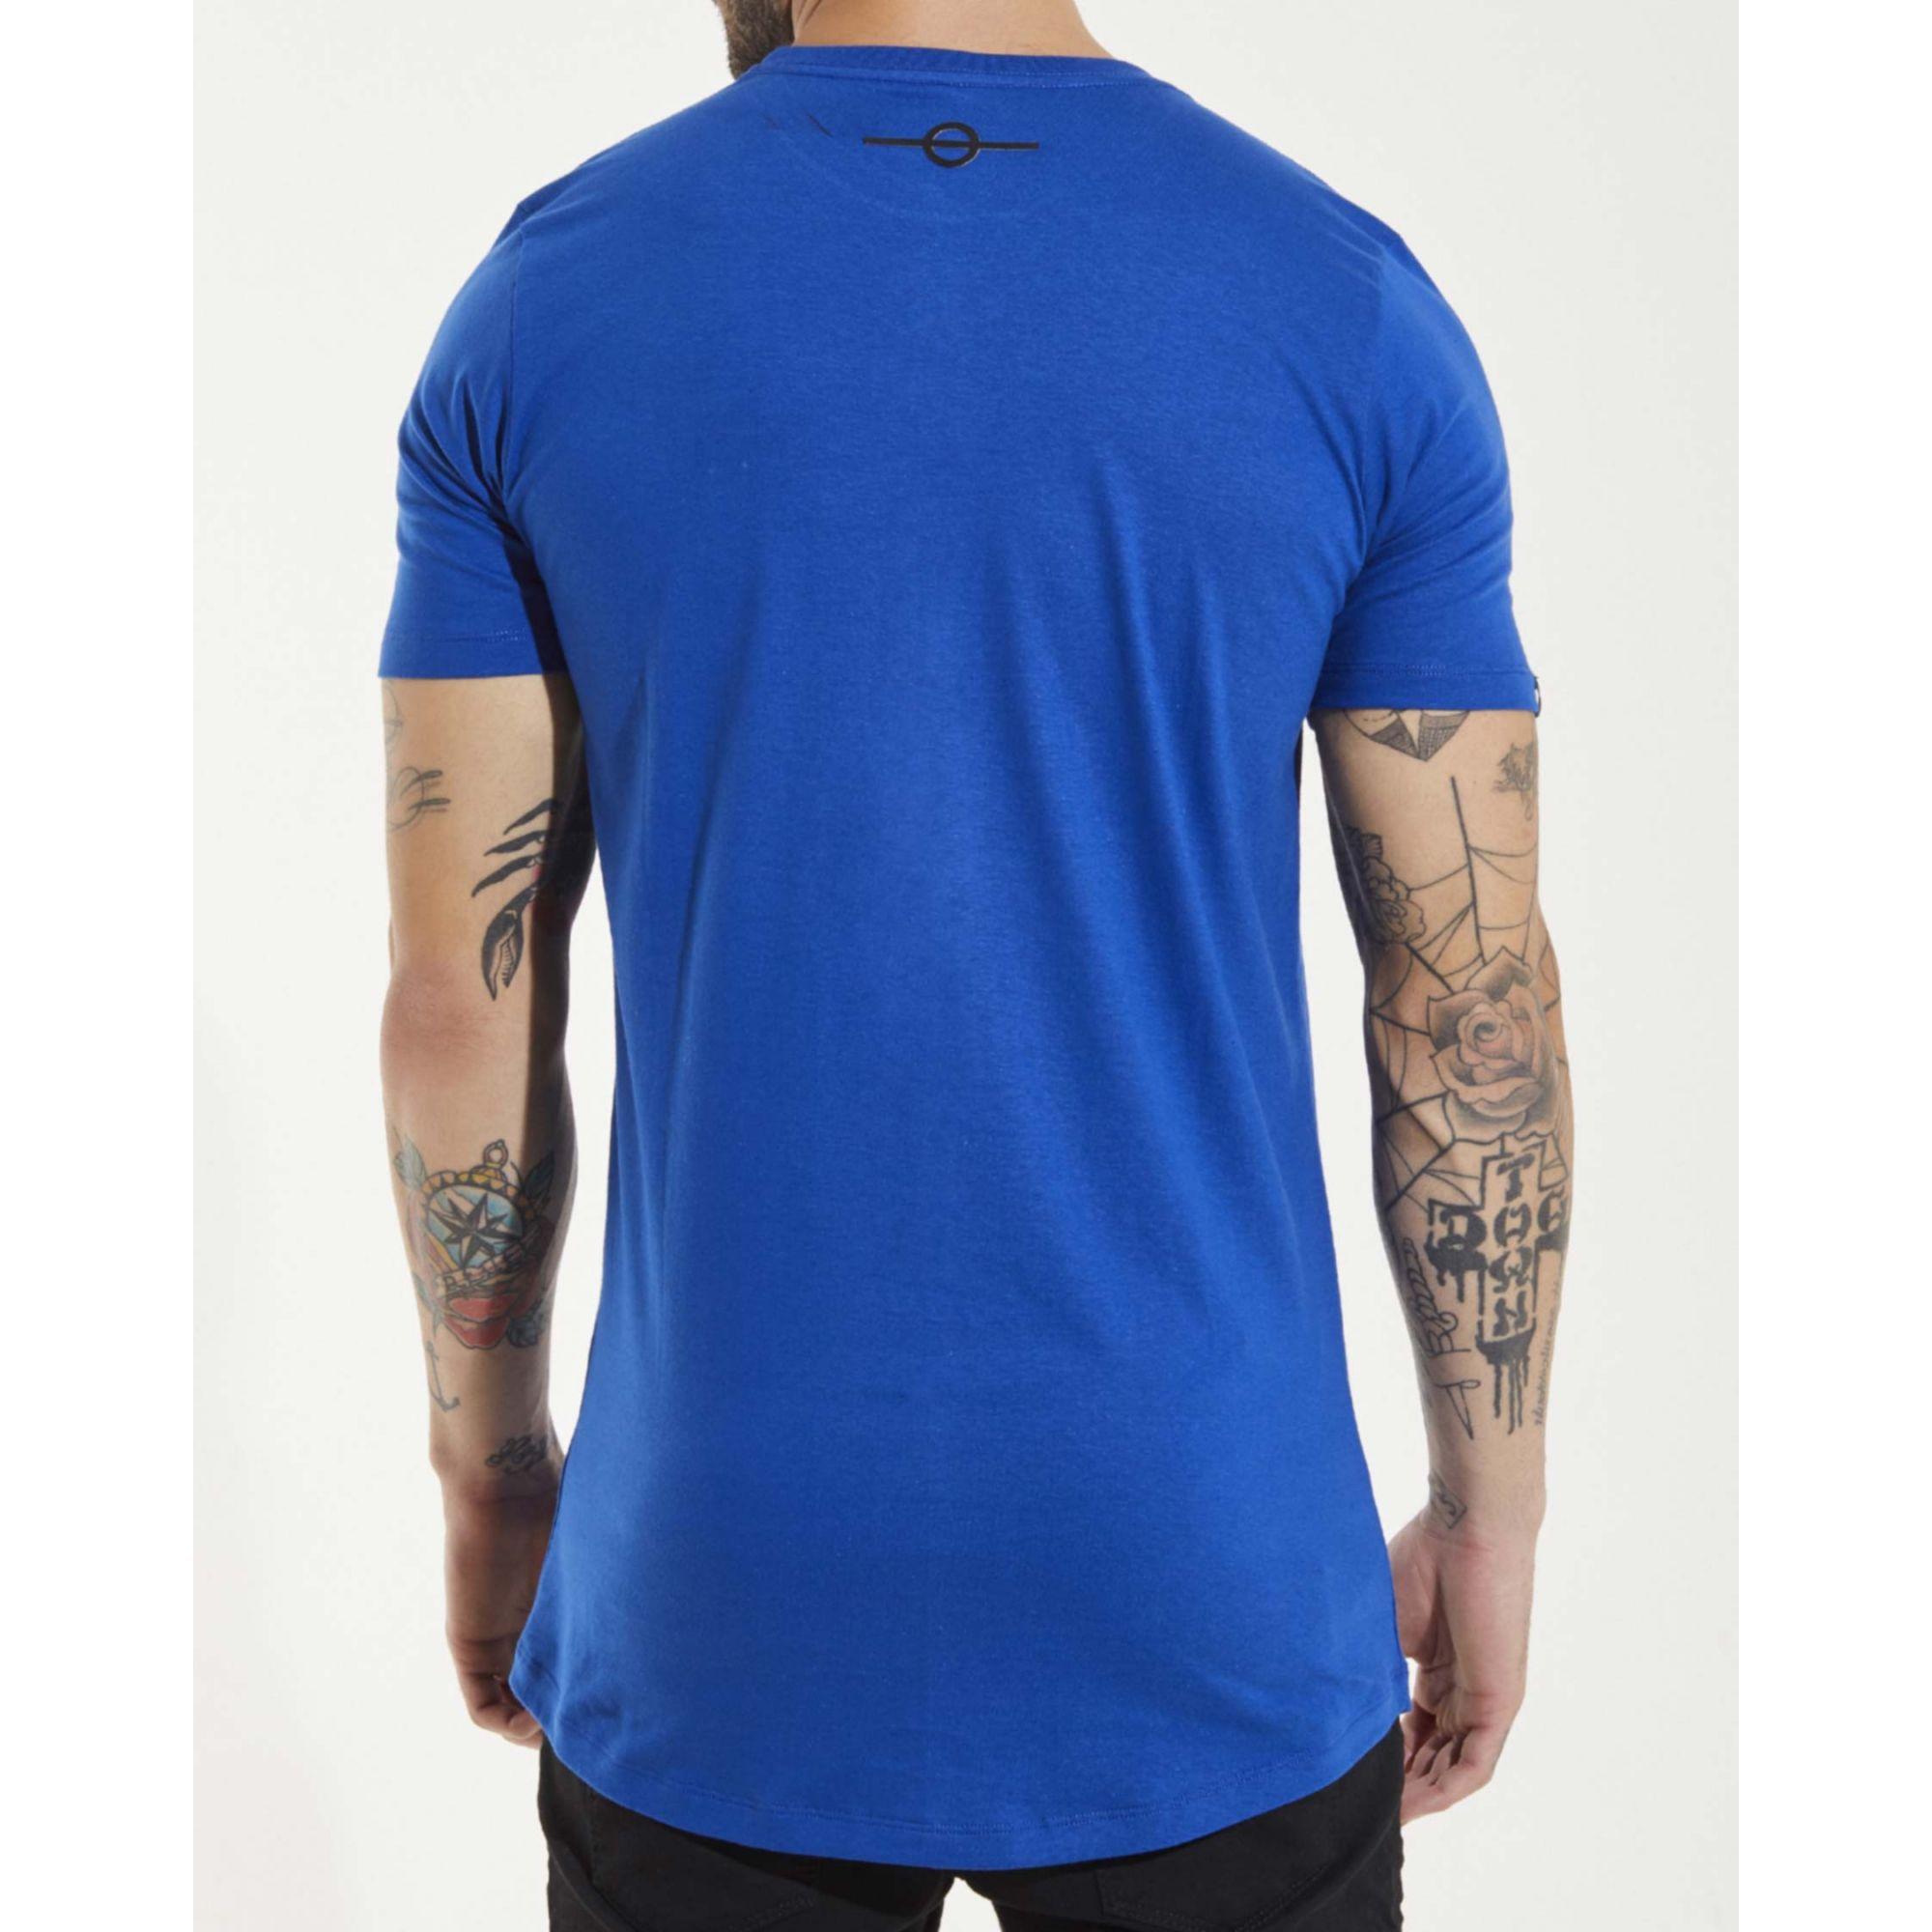 Camiseta Buh Plaquinha Blue